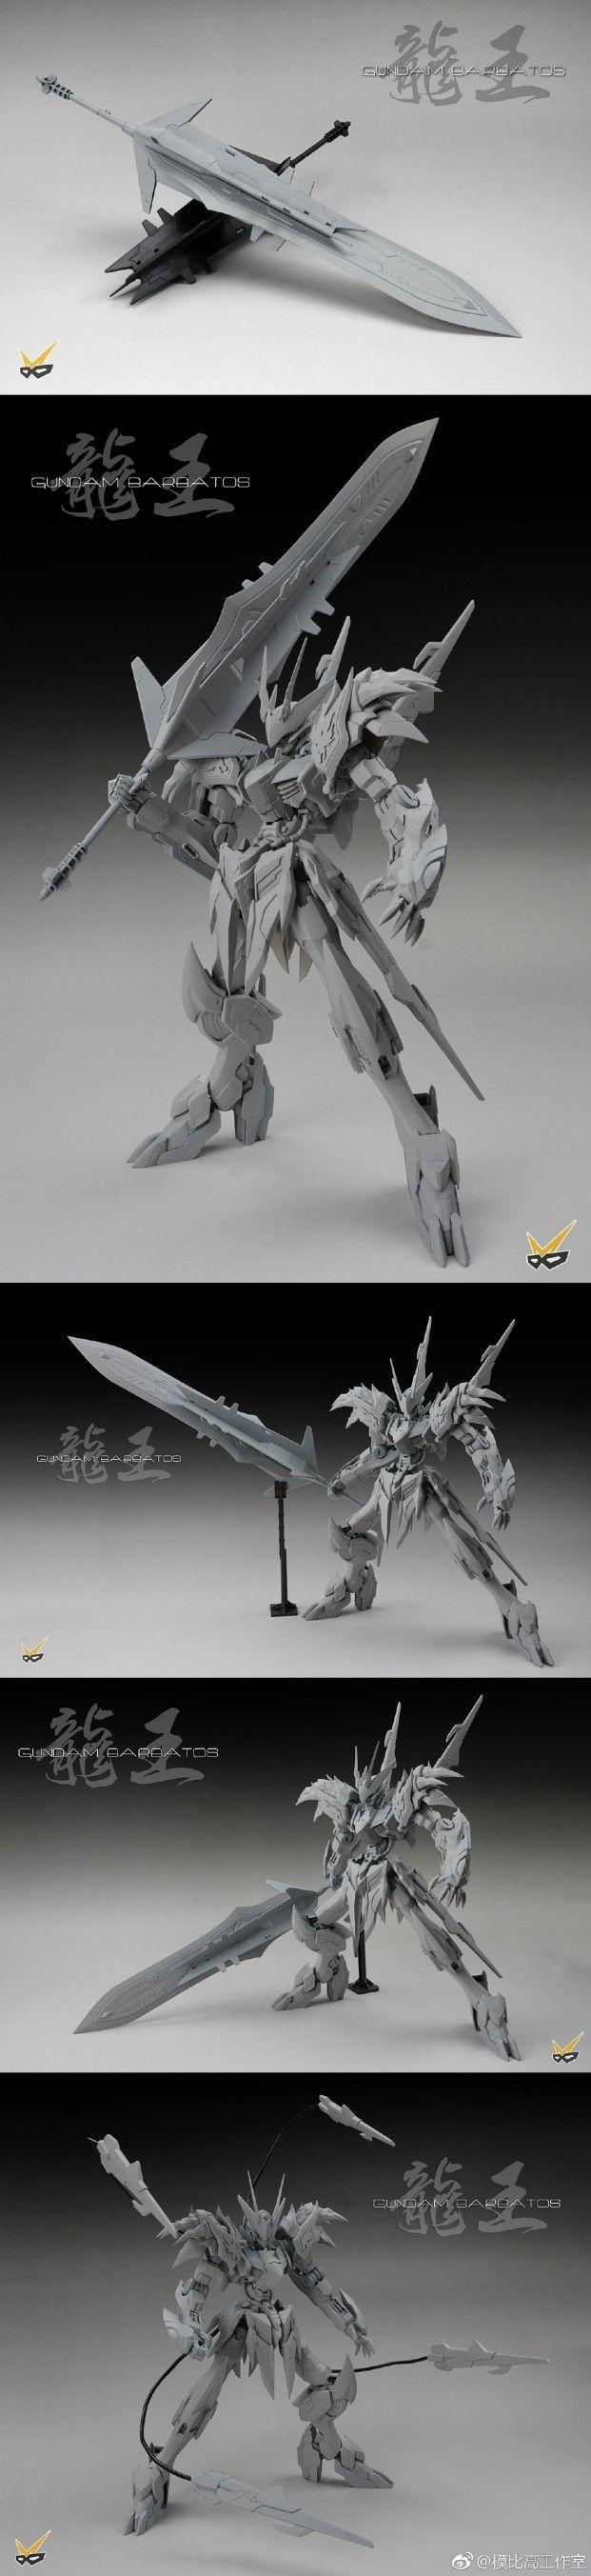 www.pointnet.com.hk - 模型改裝作品 1/100 Gundam Barbatos + 龍王丸 GK